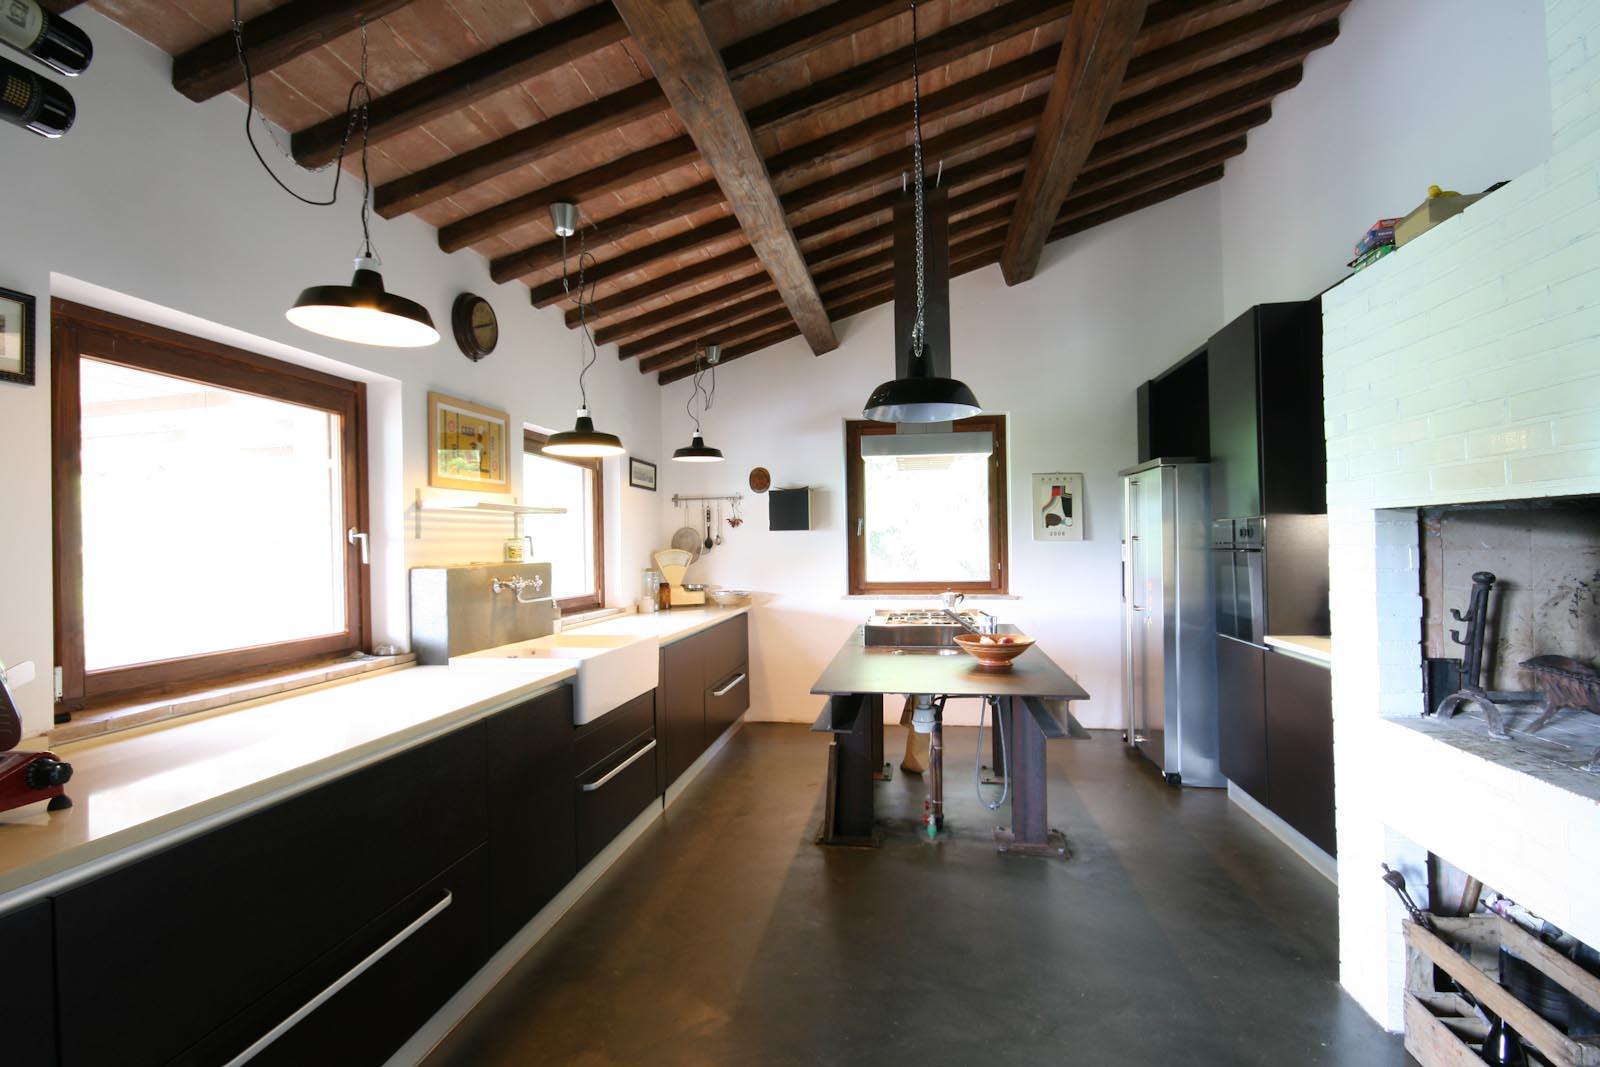 Case di campagna moderne idee di design nella vostra casa for Interni di casa moderni